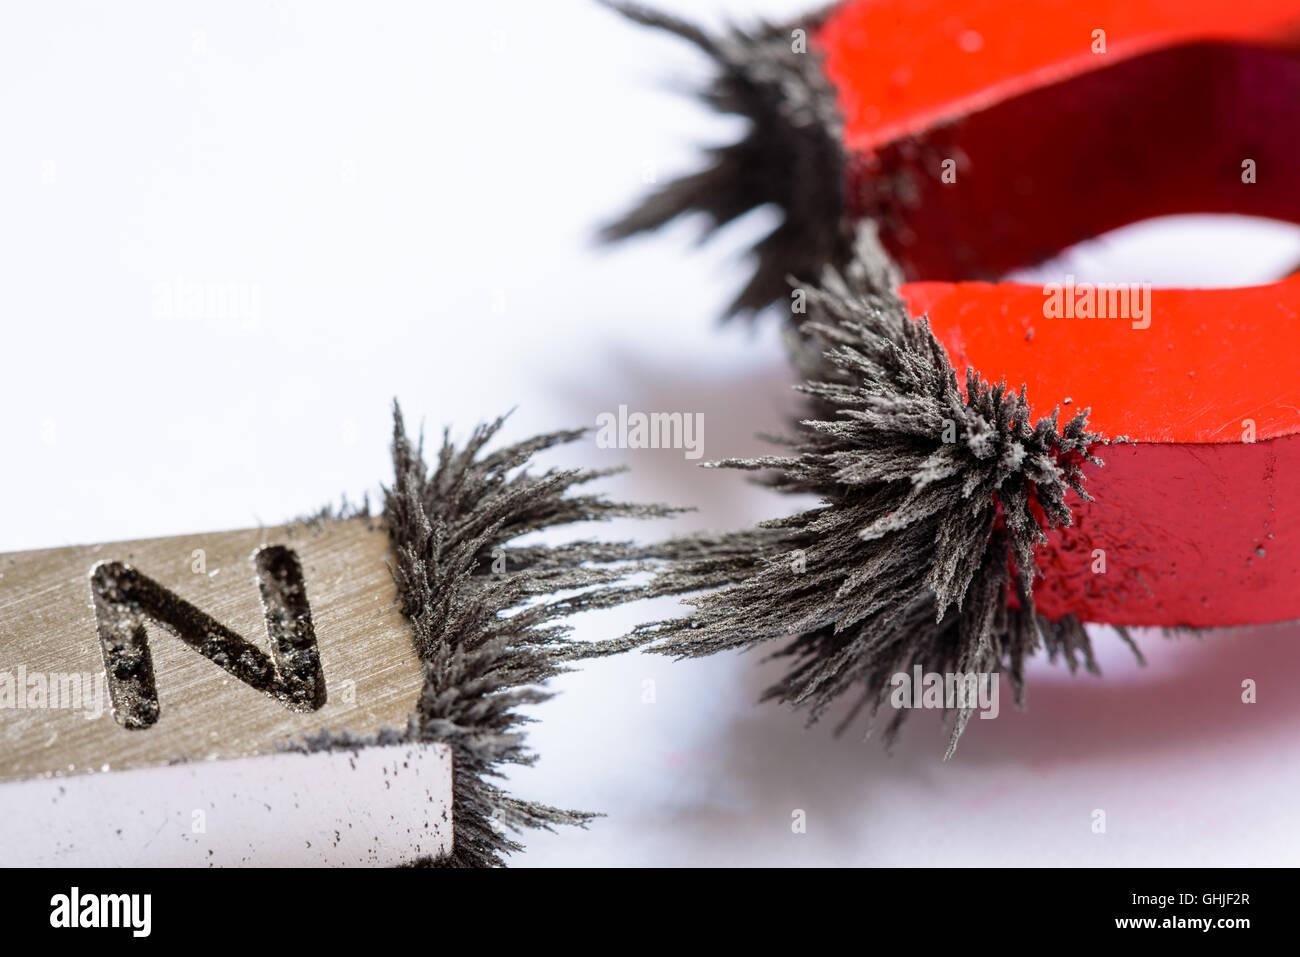 Magnetic Field Stockfotos & Magnetic Field Bilder - Alamy